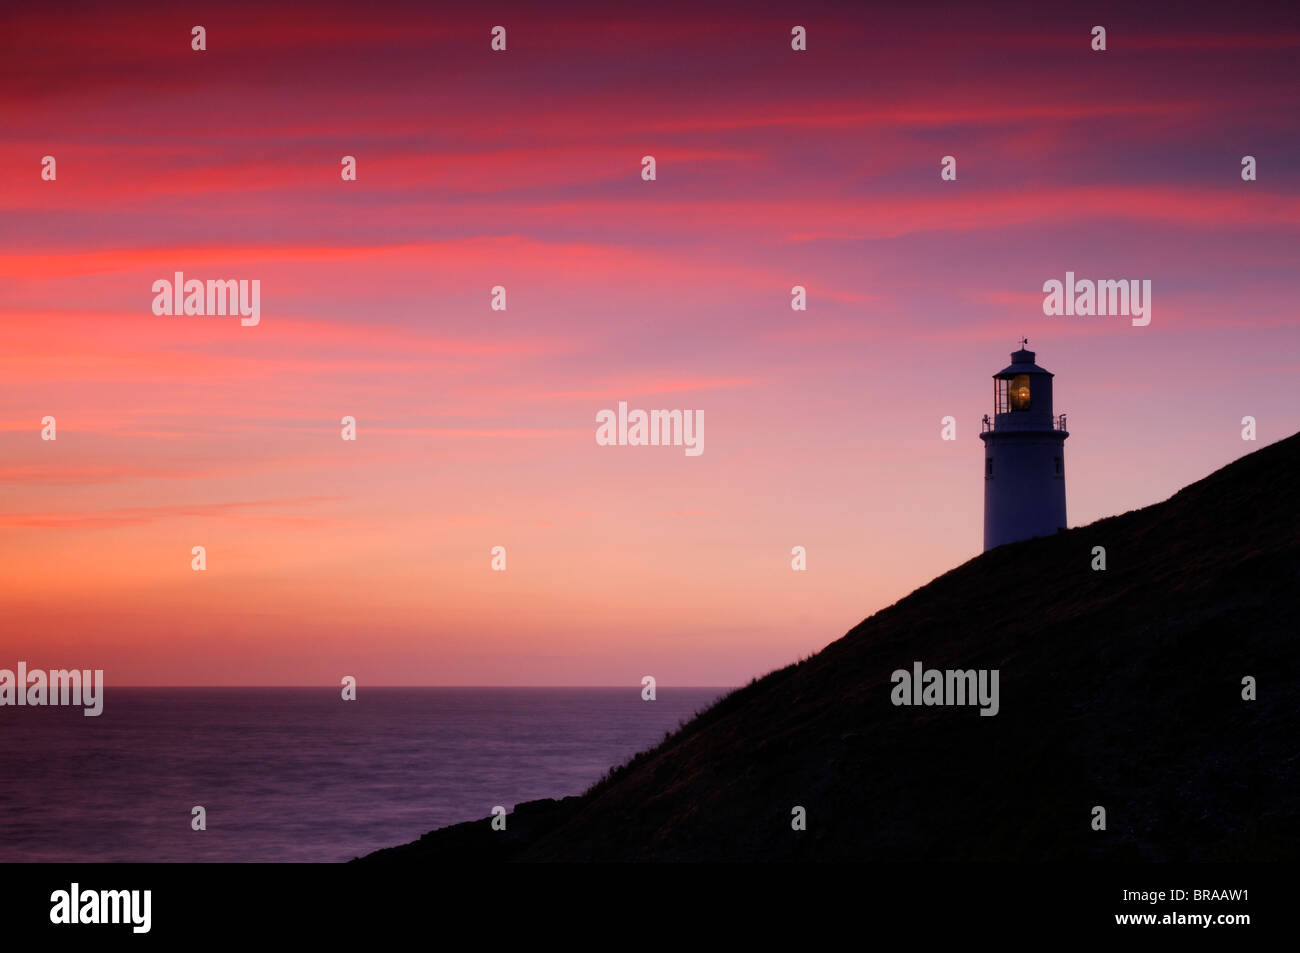 Trevose lighthouse at sunset, near Padstow, Cornwall, UK. July 2008. - Stock Image